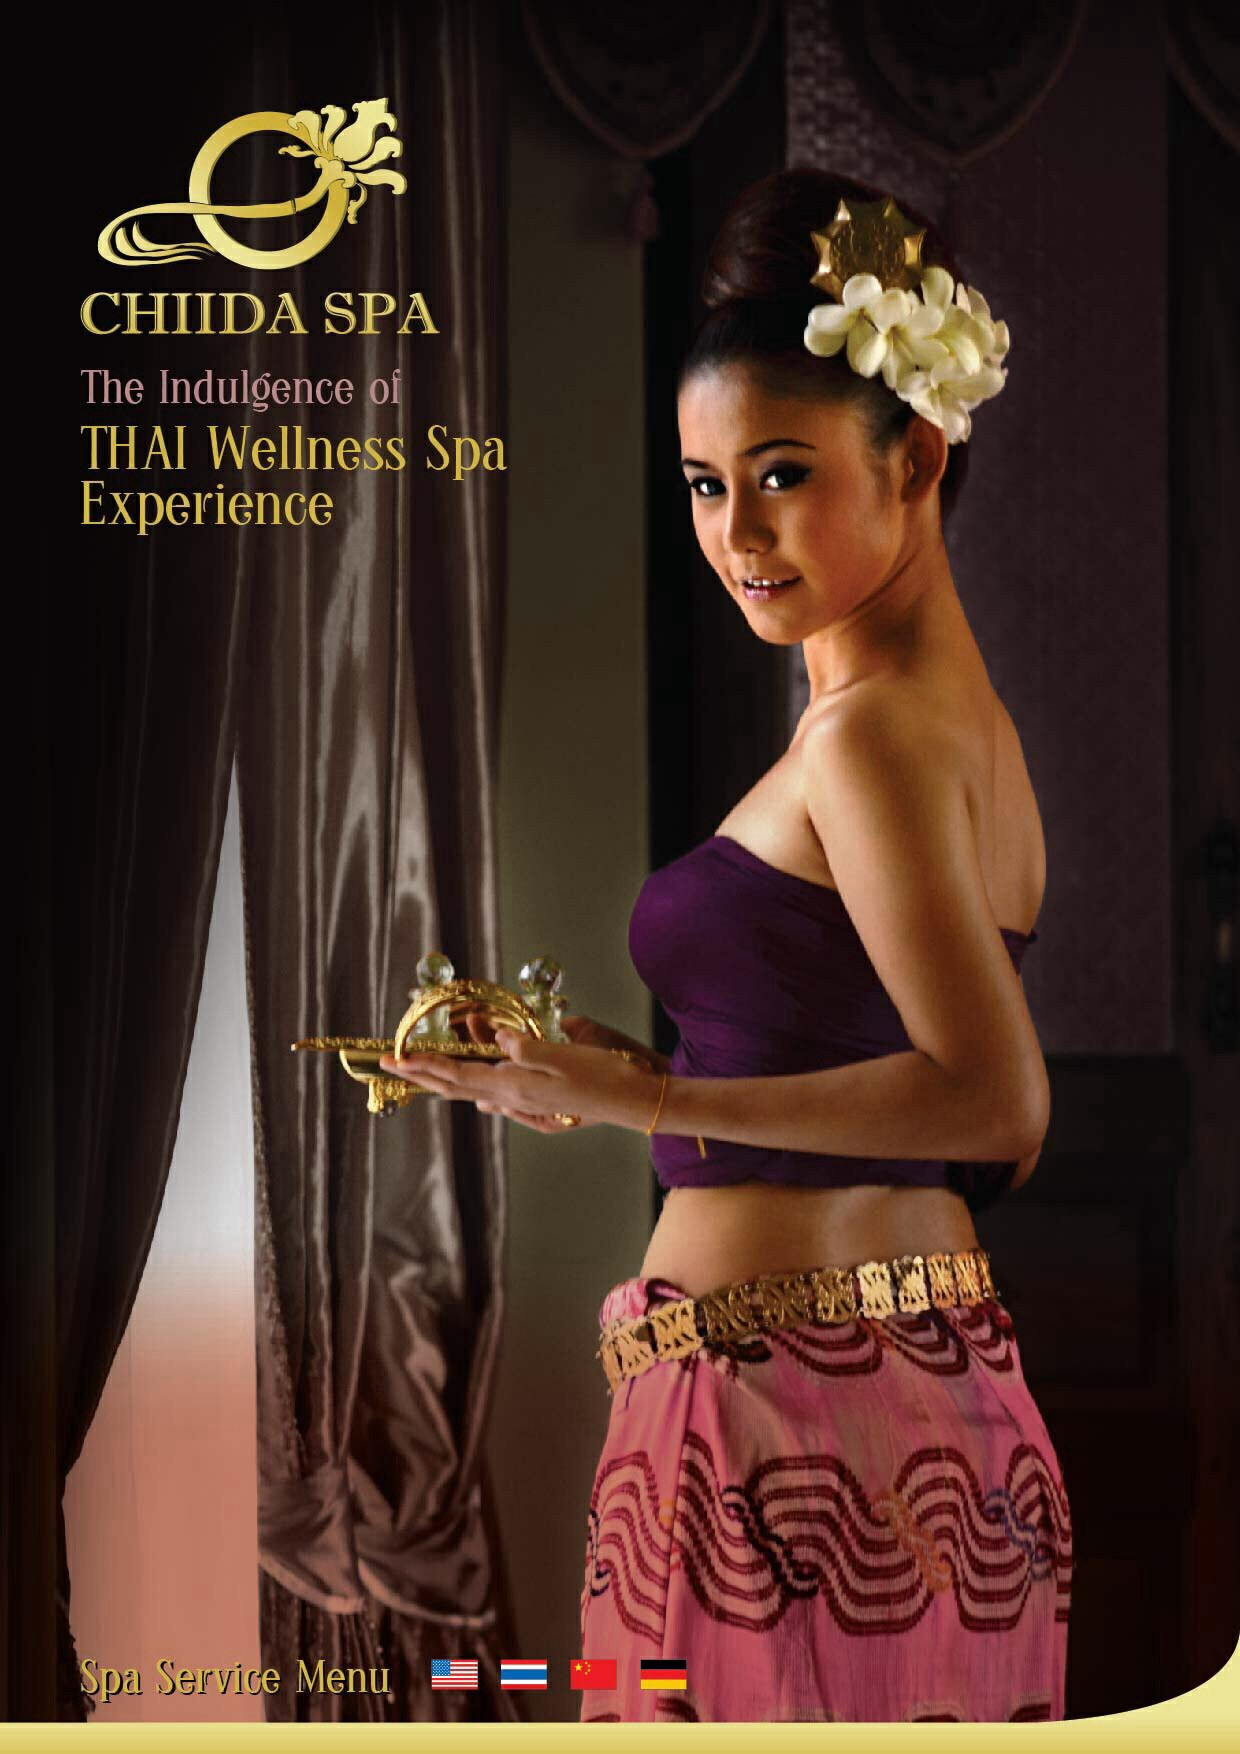 Chiida Spa Chiangmai